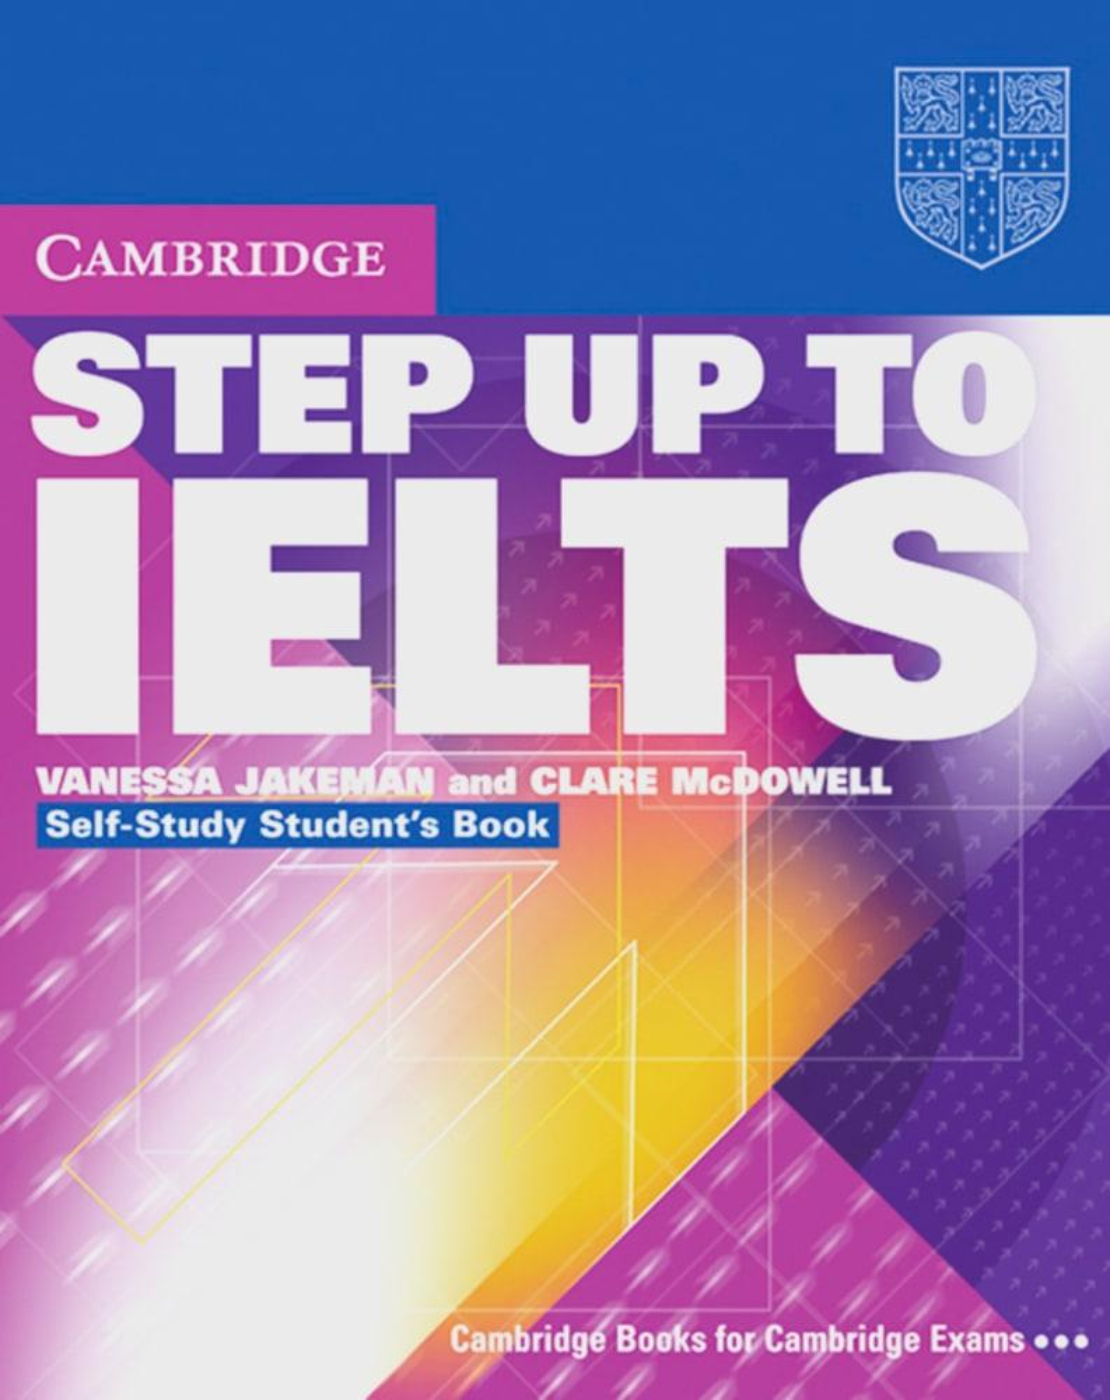 Step Up To IELTS. Self Study Student's Book, Vanessa Jakemann